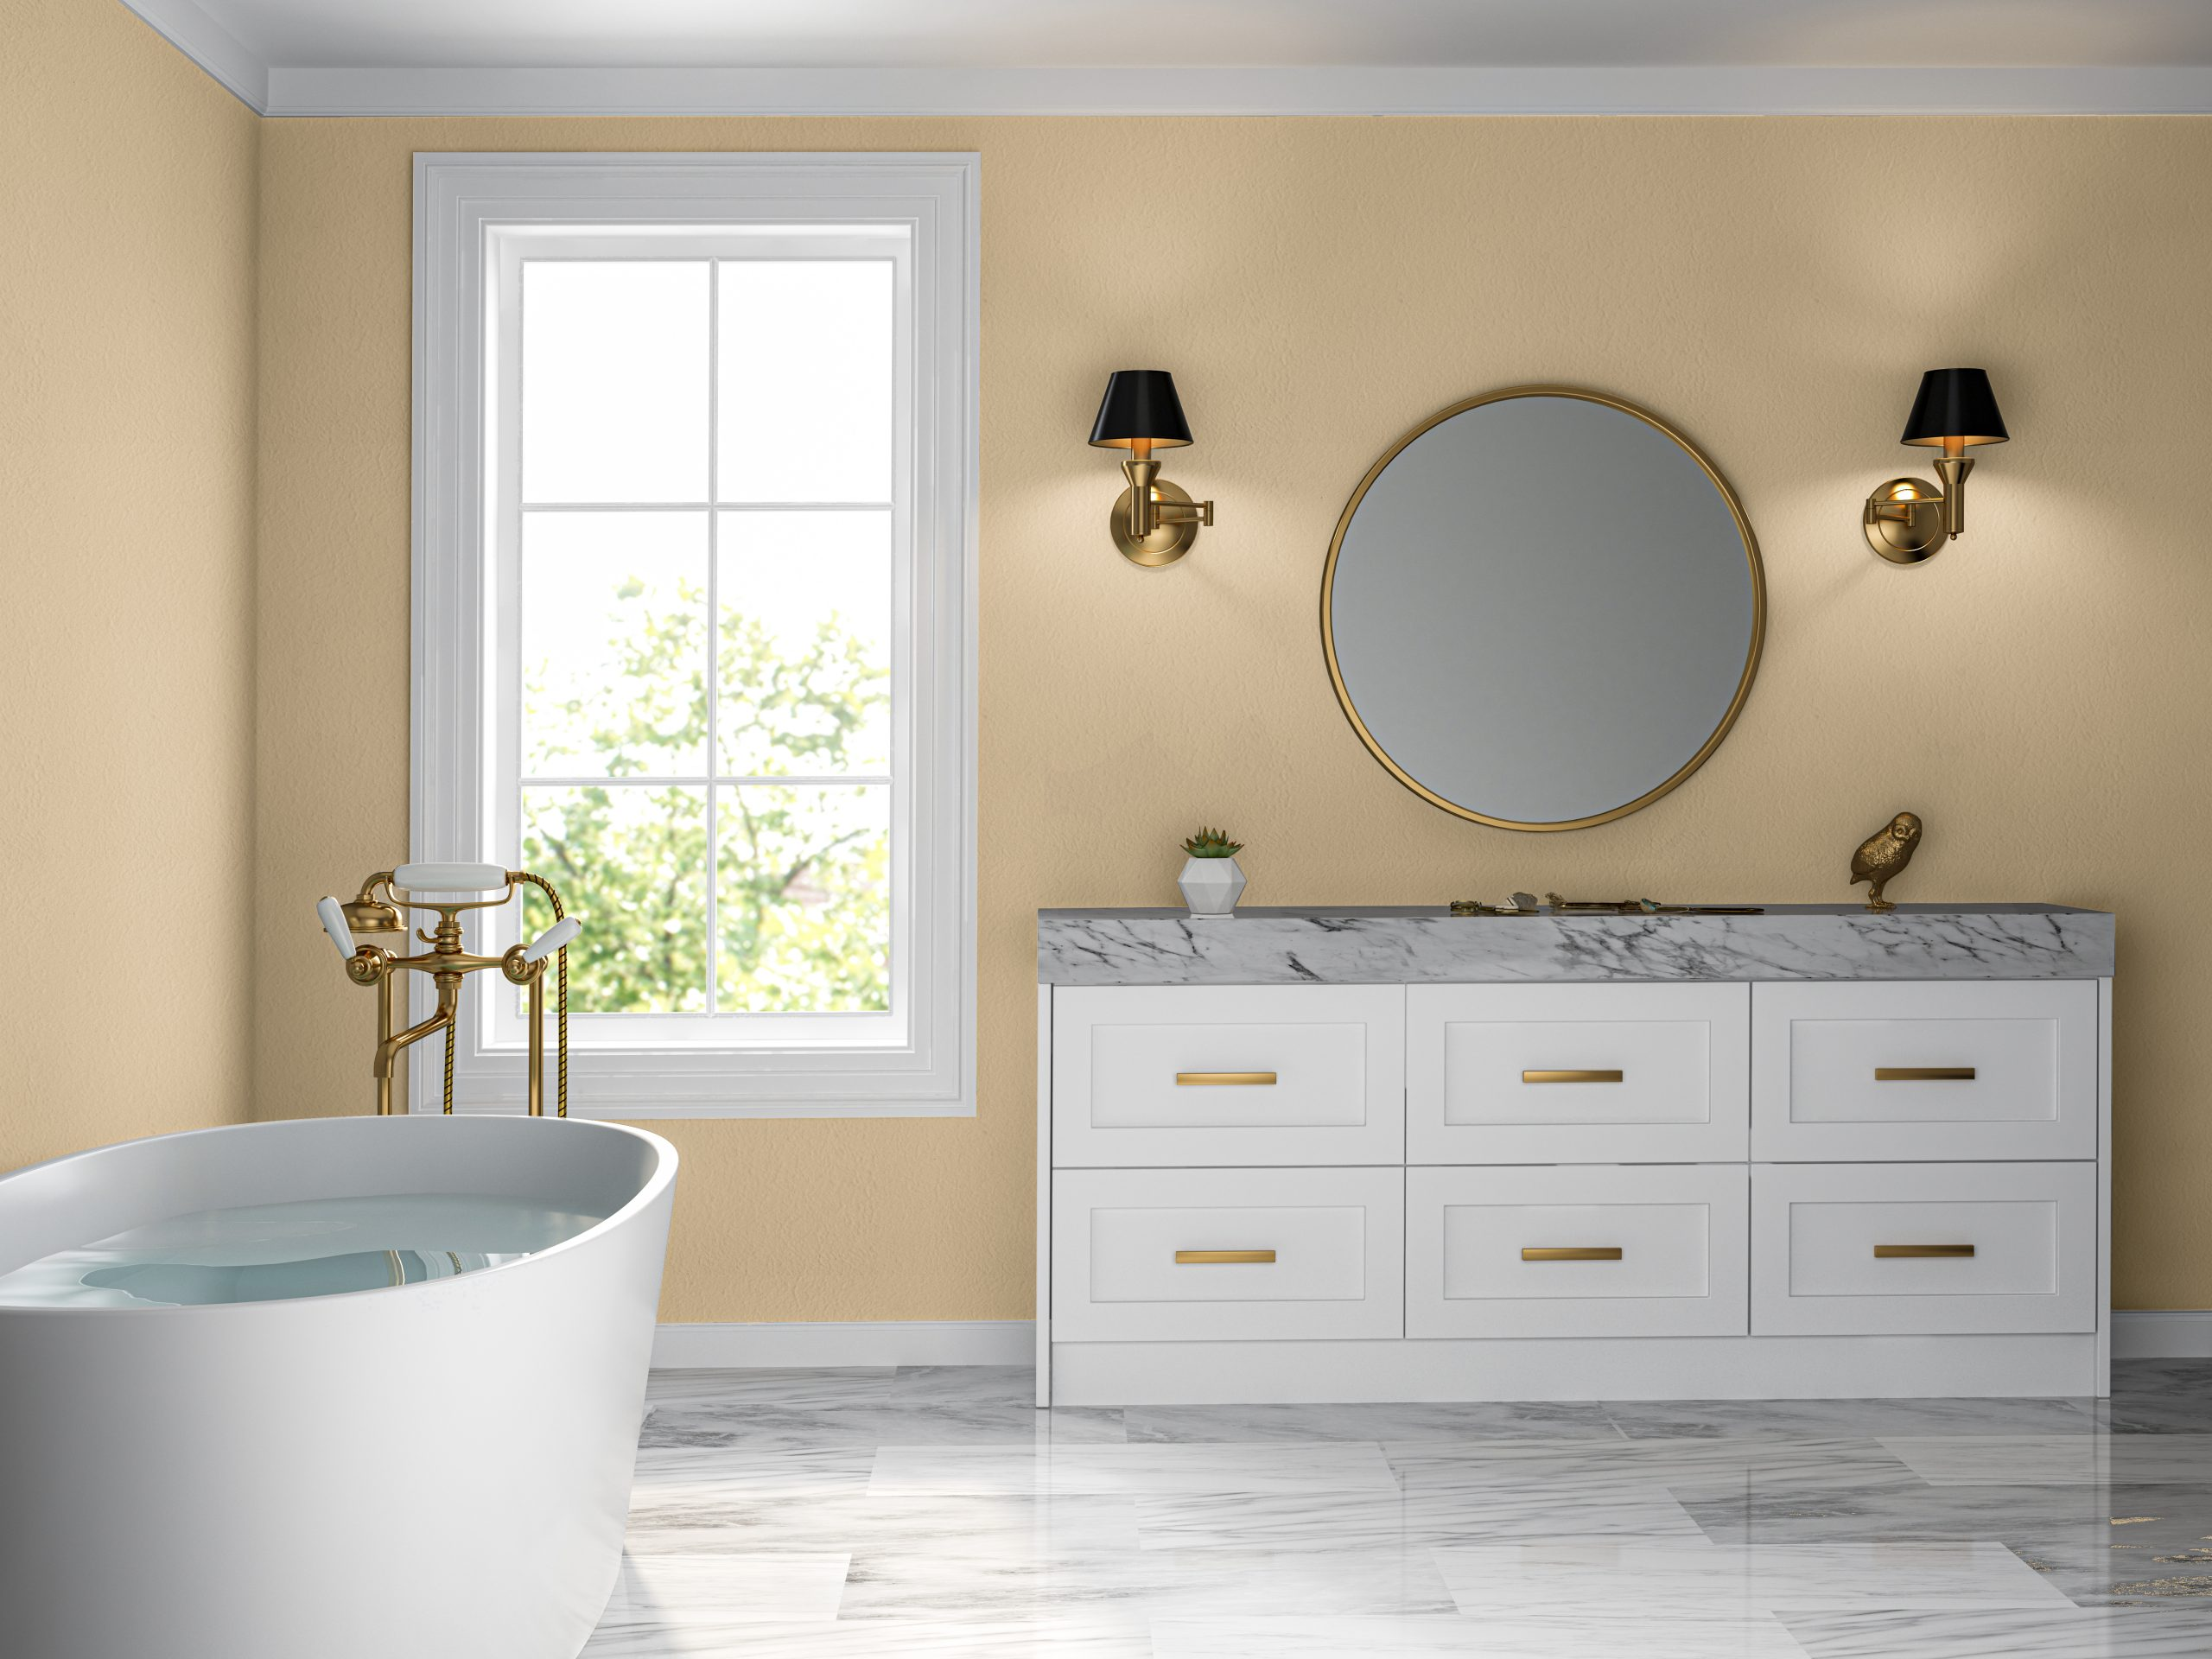 Interior bathroom classic style 3 D rendering